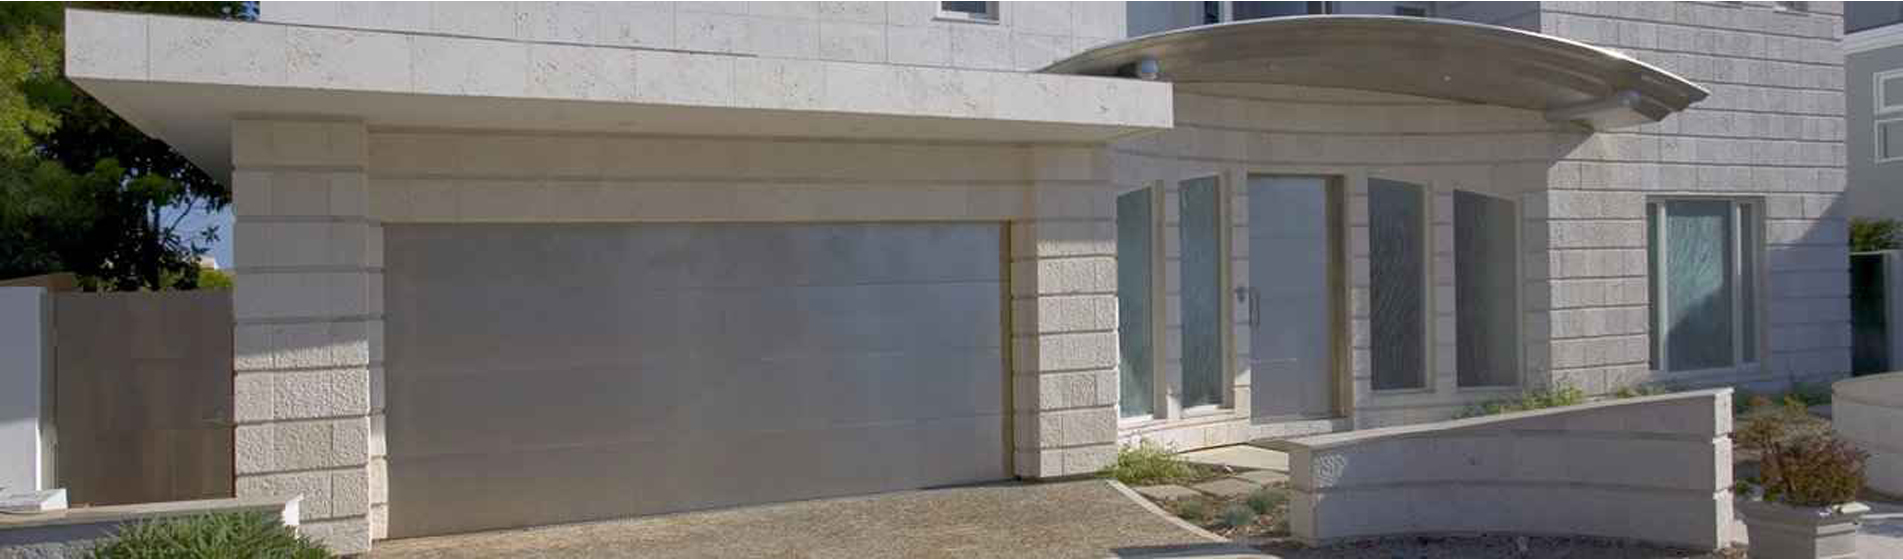 prix porte de garage avec portillon 84300